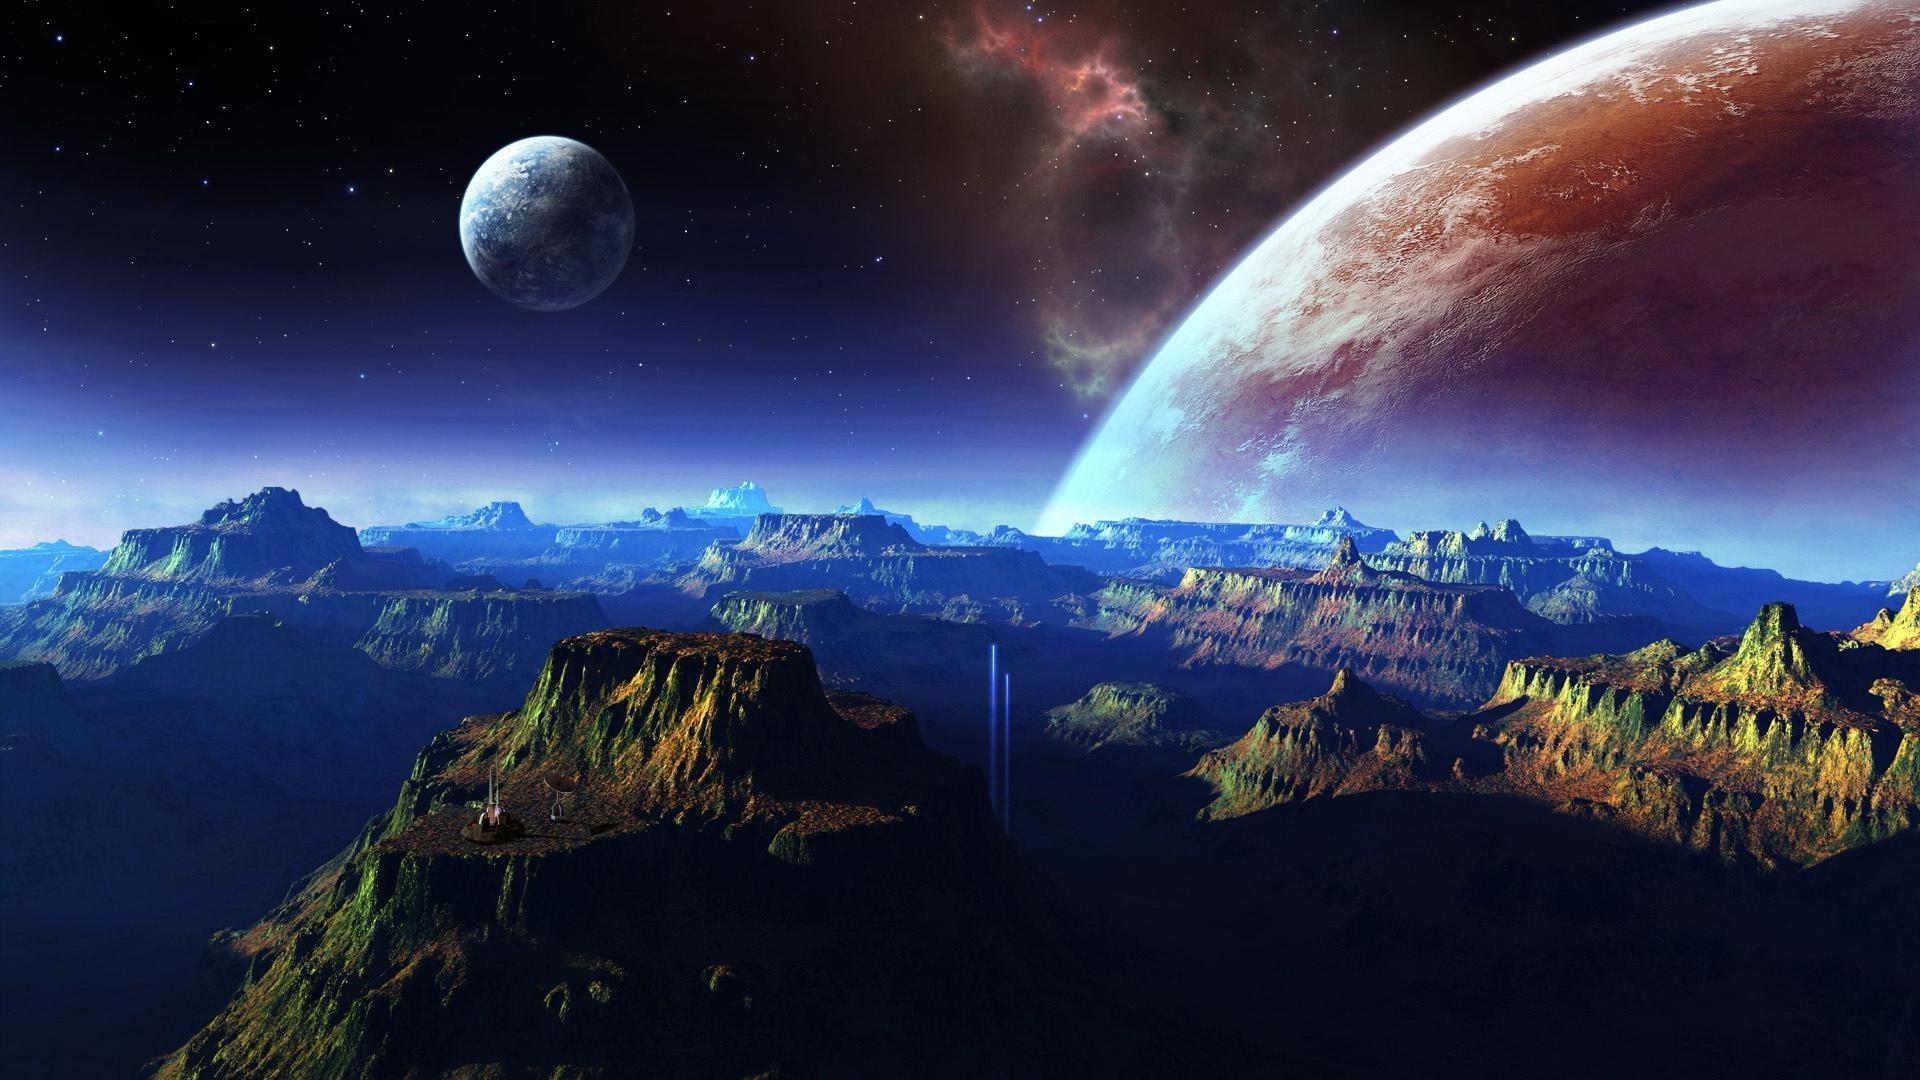 Download Best fantasy galaxy space wallpaper for your Desktop